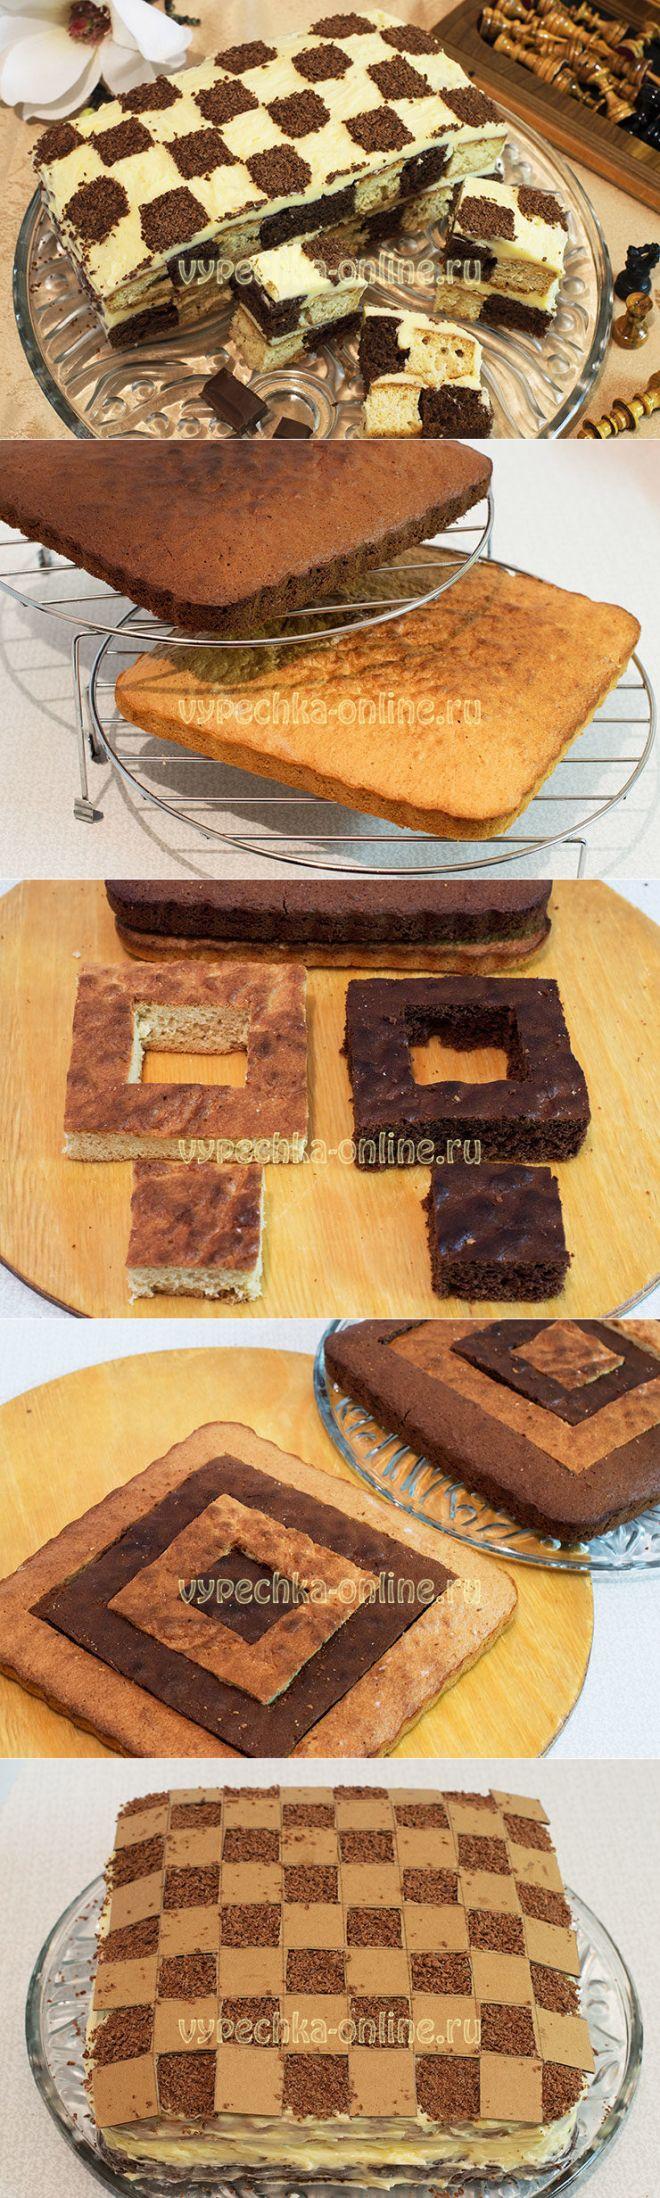 📌 Бисквитный торт Шахматная доска 🎂  ➡ http://vypechka-online.ru/torty-i-pirozhnye/biskvitnyj-tort-shahmatnaya-doska/  #Торт #Бисквит #Шахматы #ШахматнаяДоска #Выпечка #Рецепты #Вкусняшка #ВыпечкаОнлайн #Cake #Chess #Chessboard #Baking #Recipes #Sweets #BakingOnline